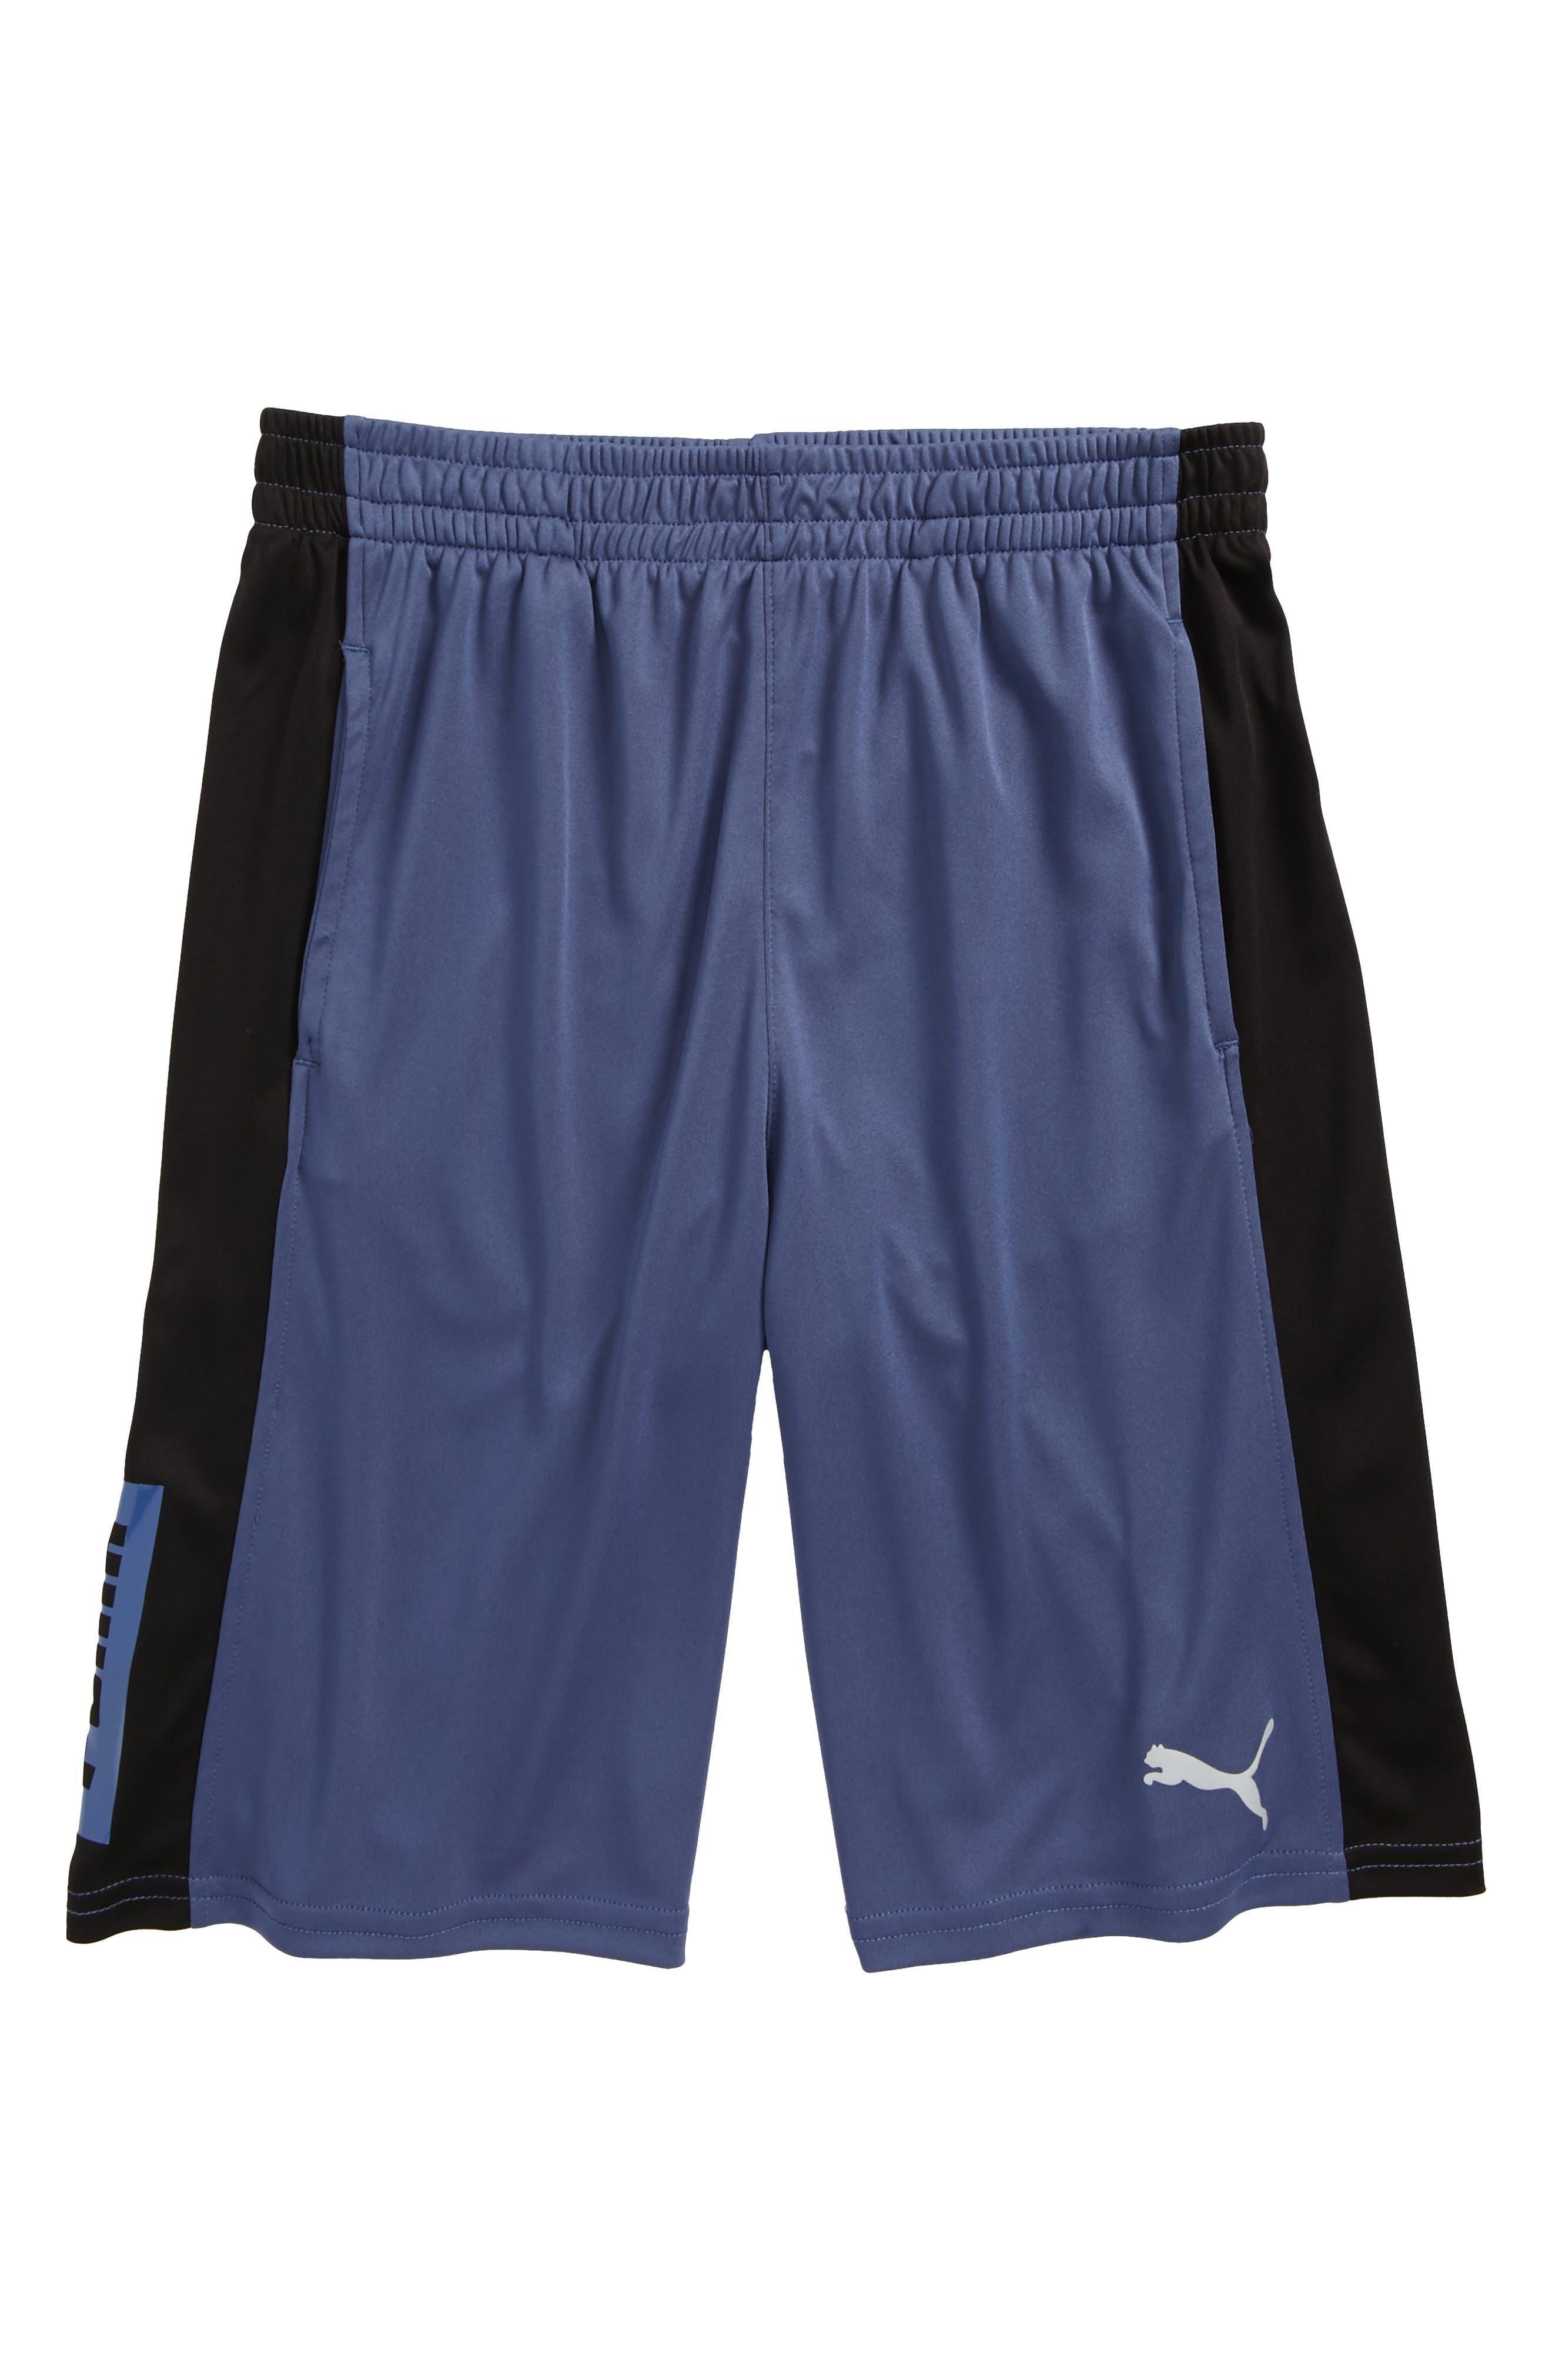 Colorblock Perforated Shorts,                         Main,                         color, Blue Indigo